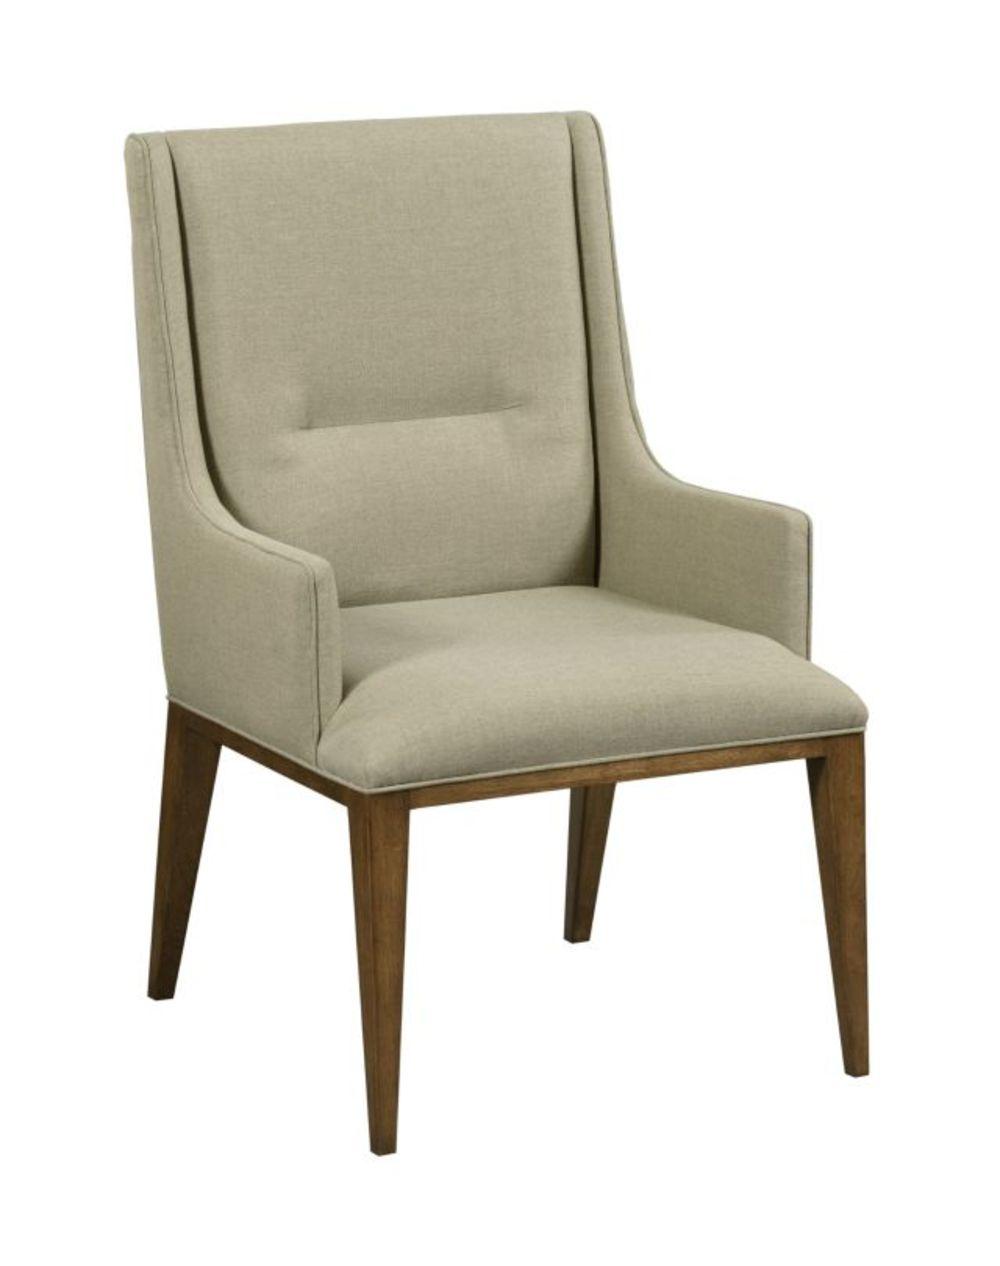 American Drew - Contour Arm Chair